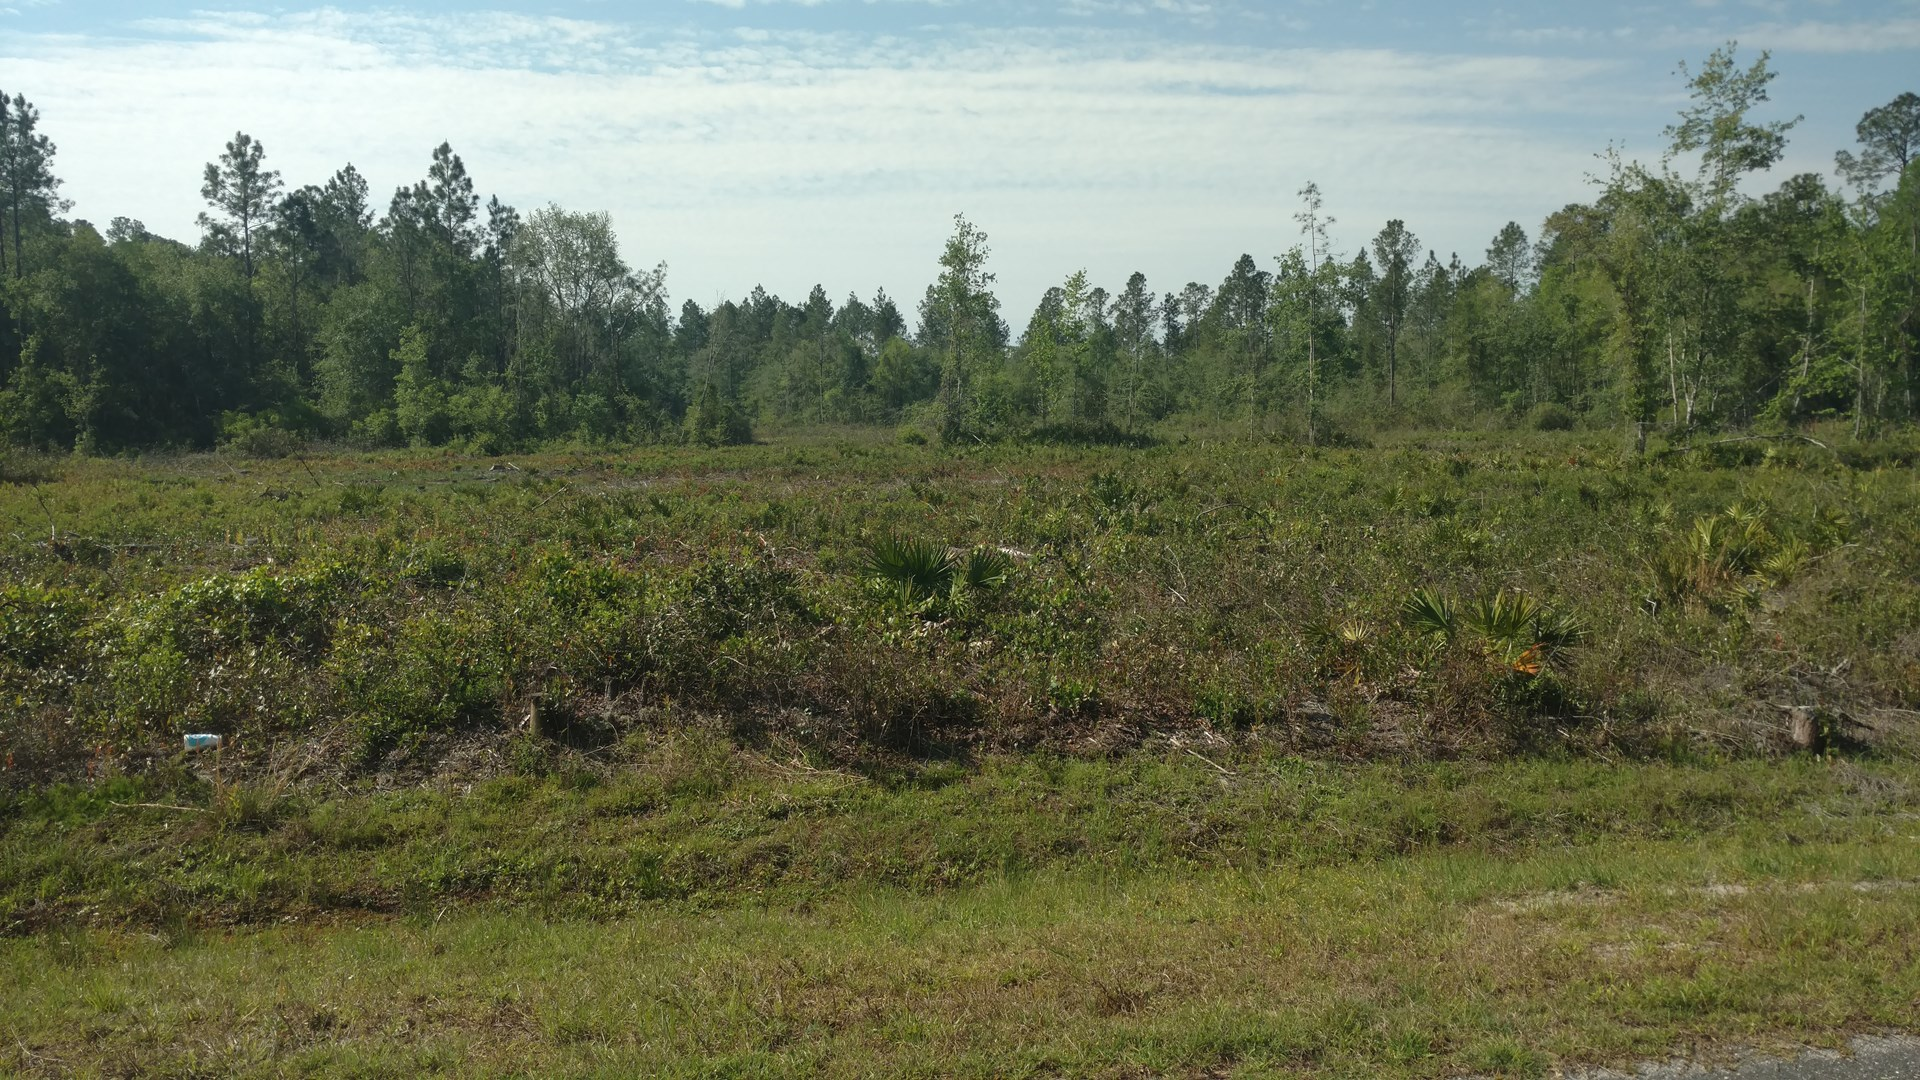 NORTH FLORIDA ACREAGE ADJOINING THE OSCEOLA FOREST